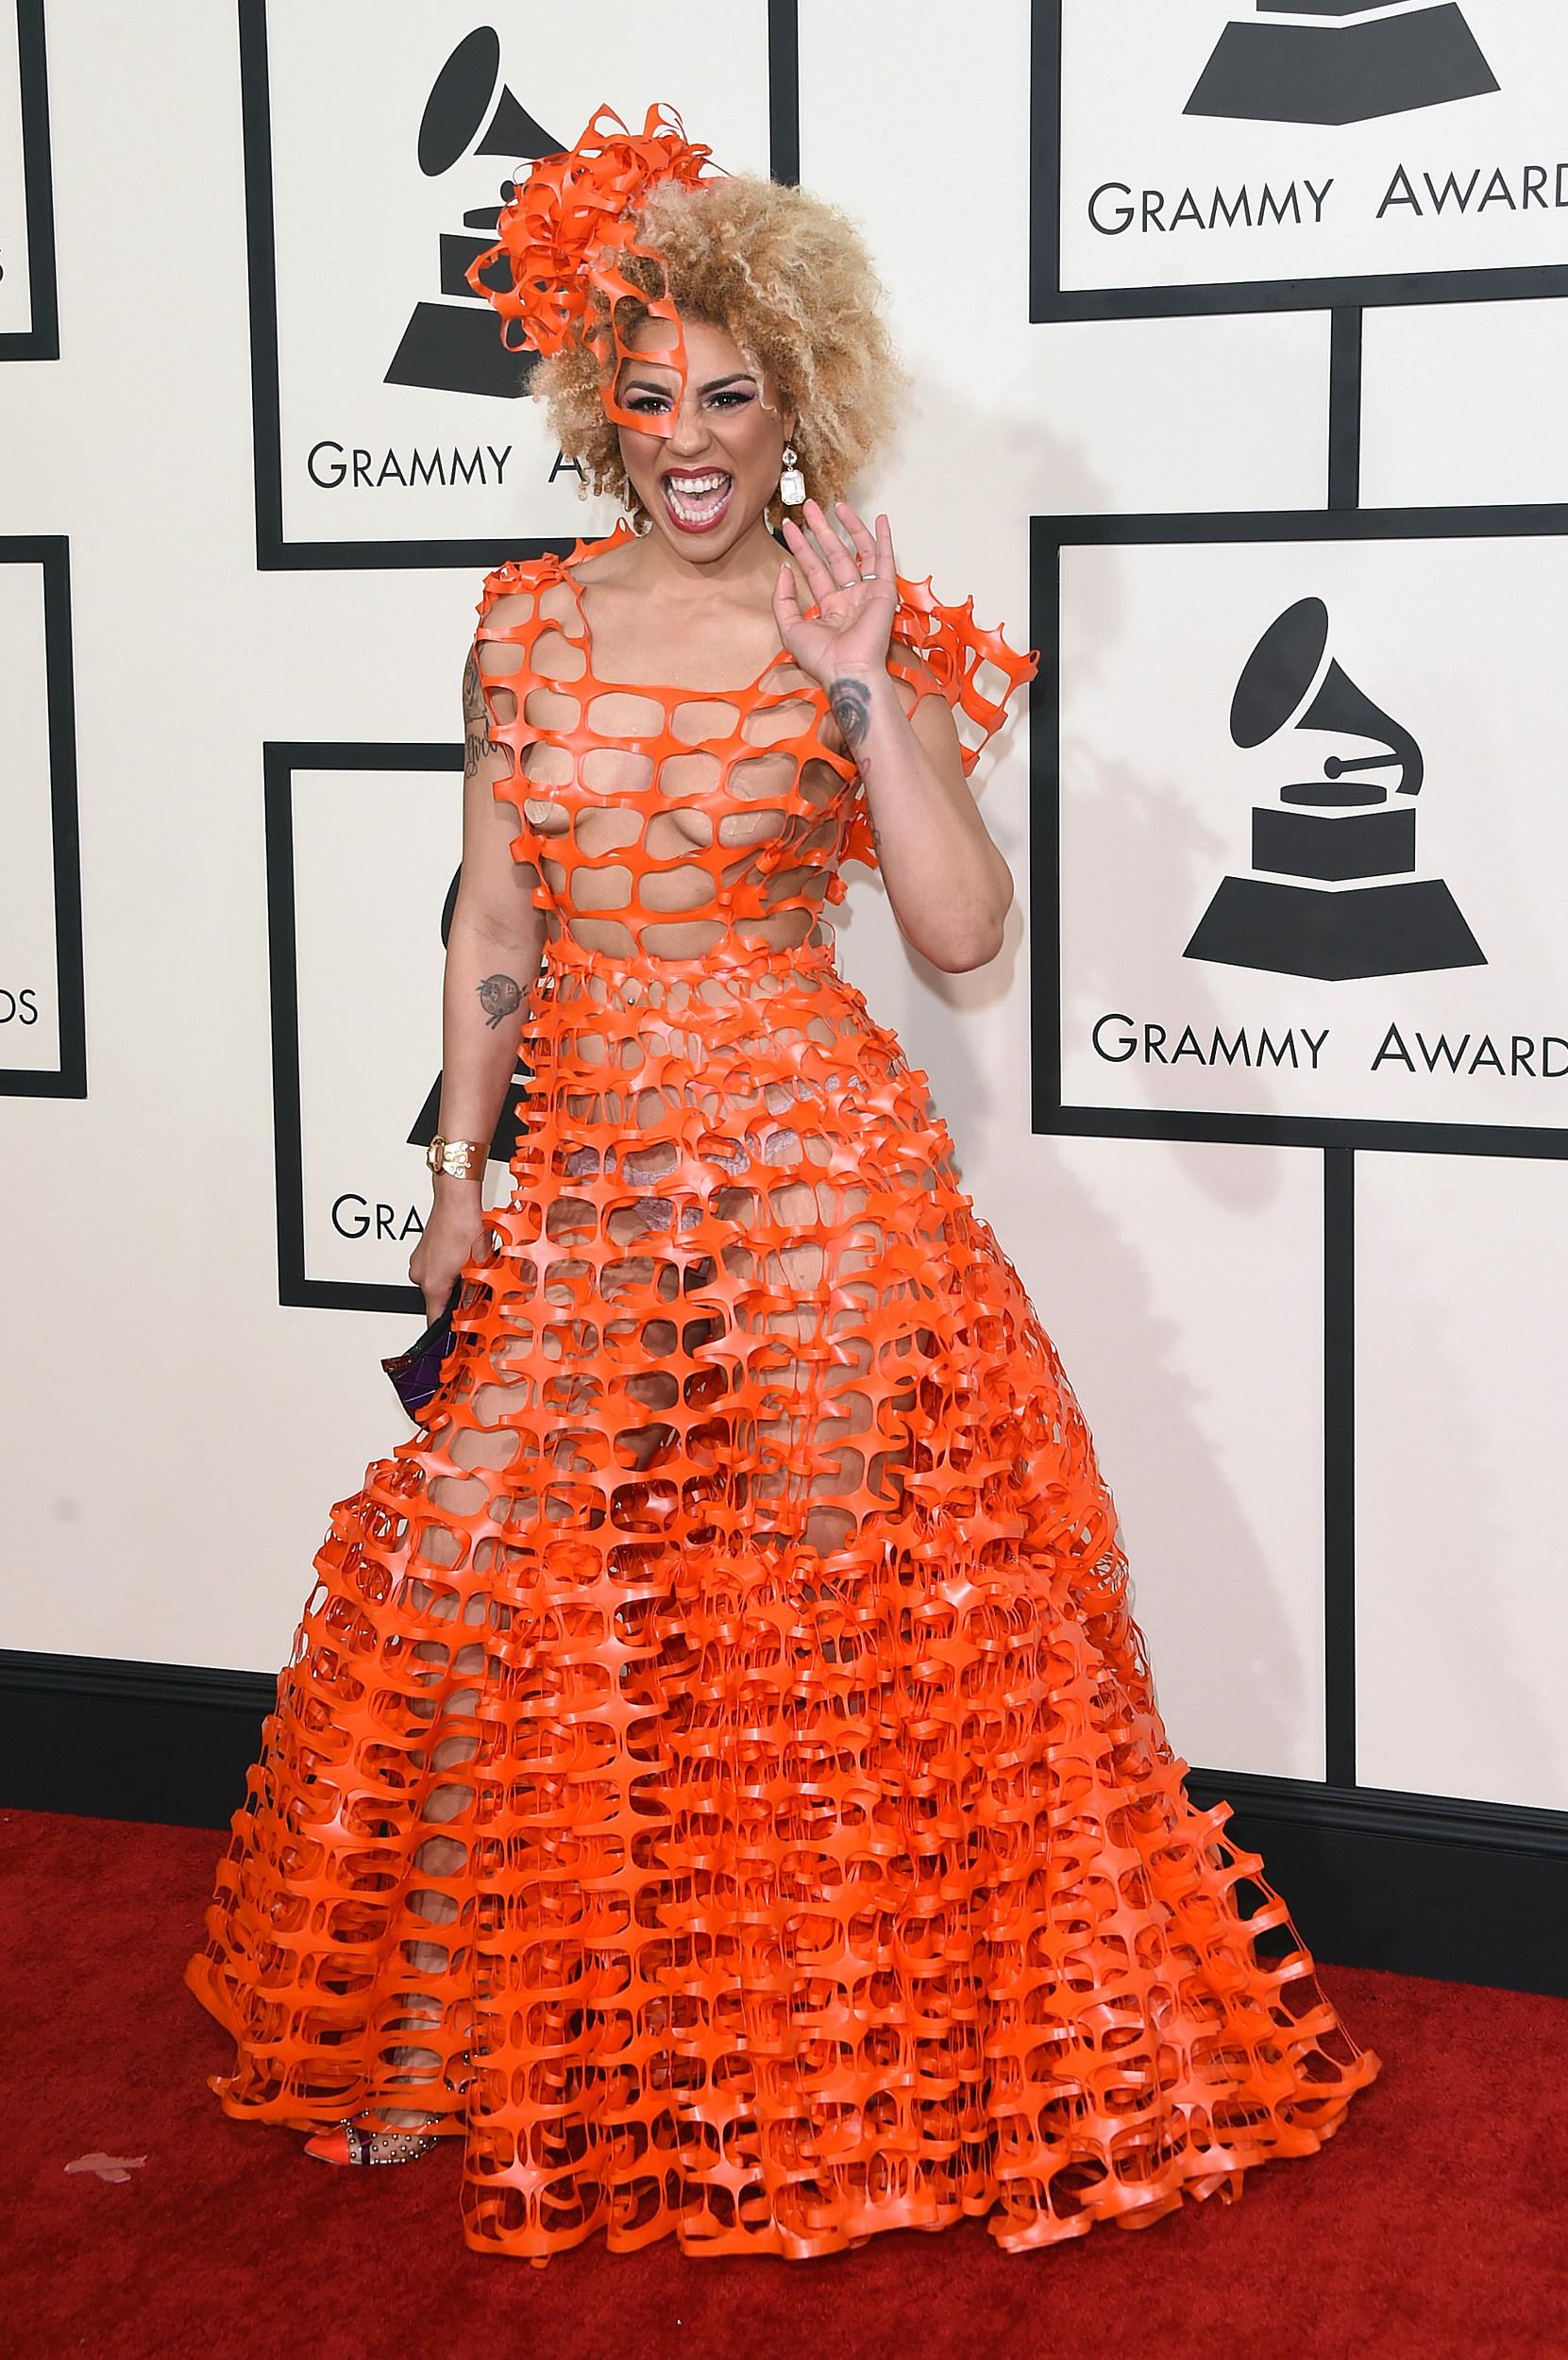 Joy Villa Wears Plastic Dress To 2015 Grammy Awards Photo